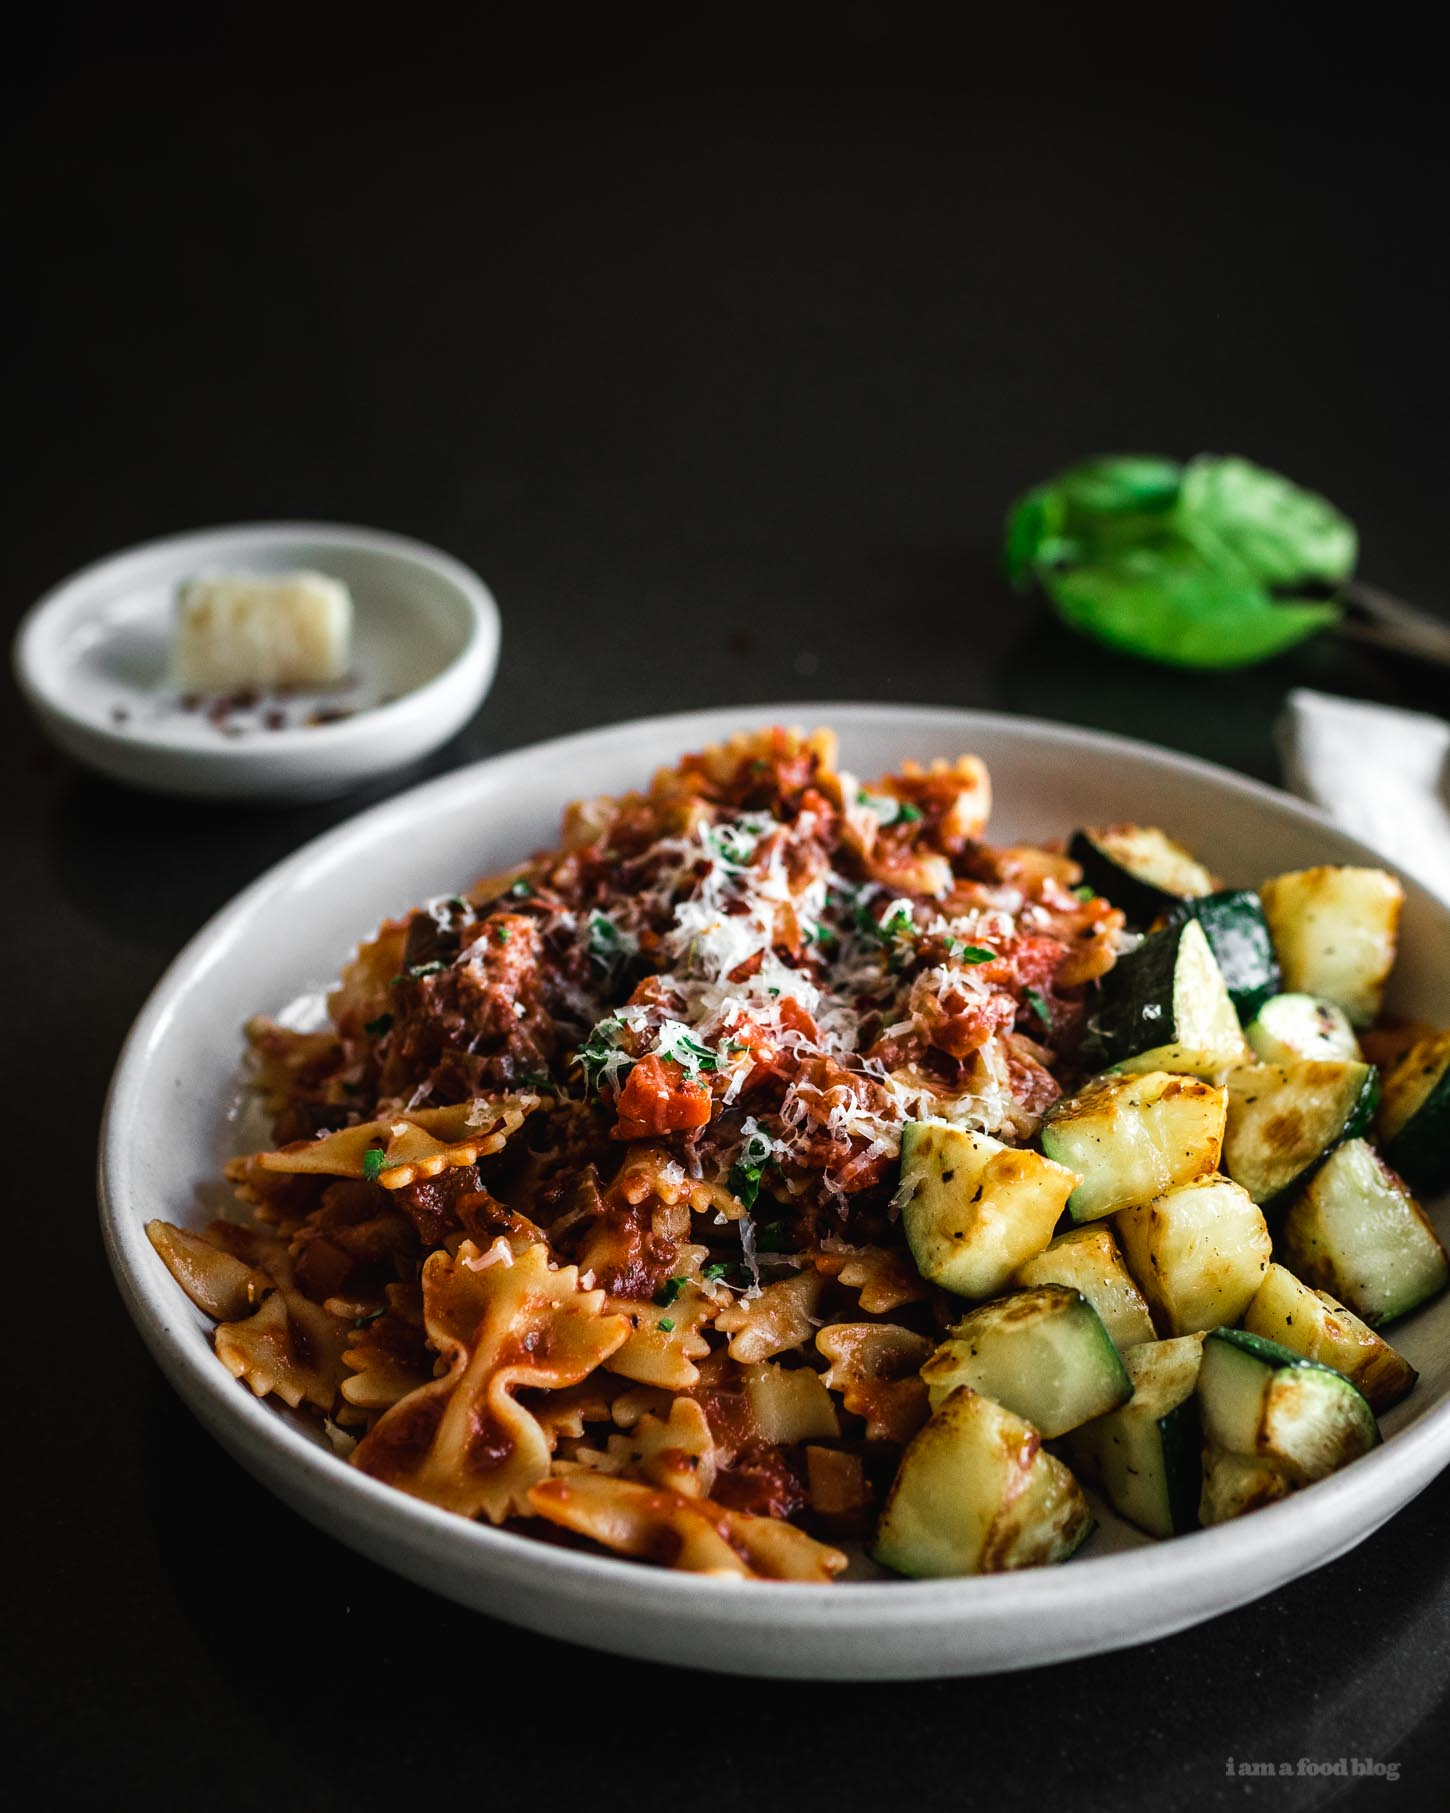 vegetable marinara sauce recipe - www.iamafoodblog.com